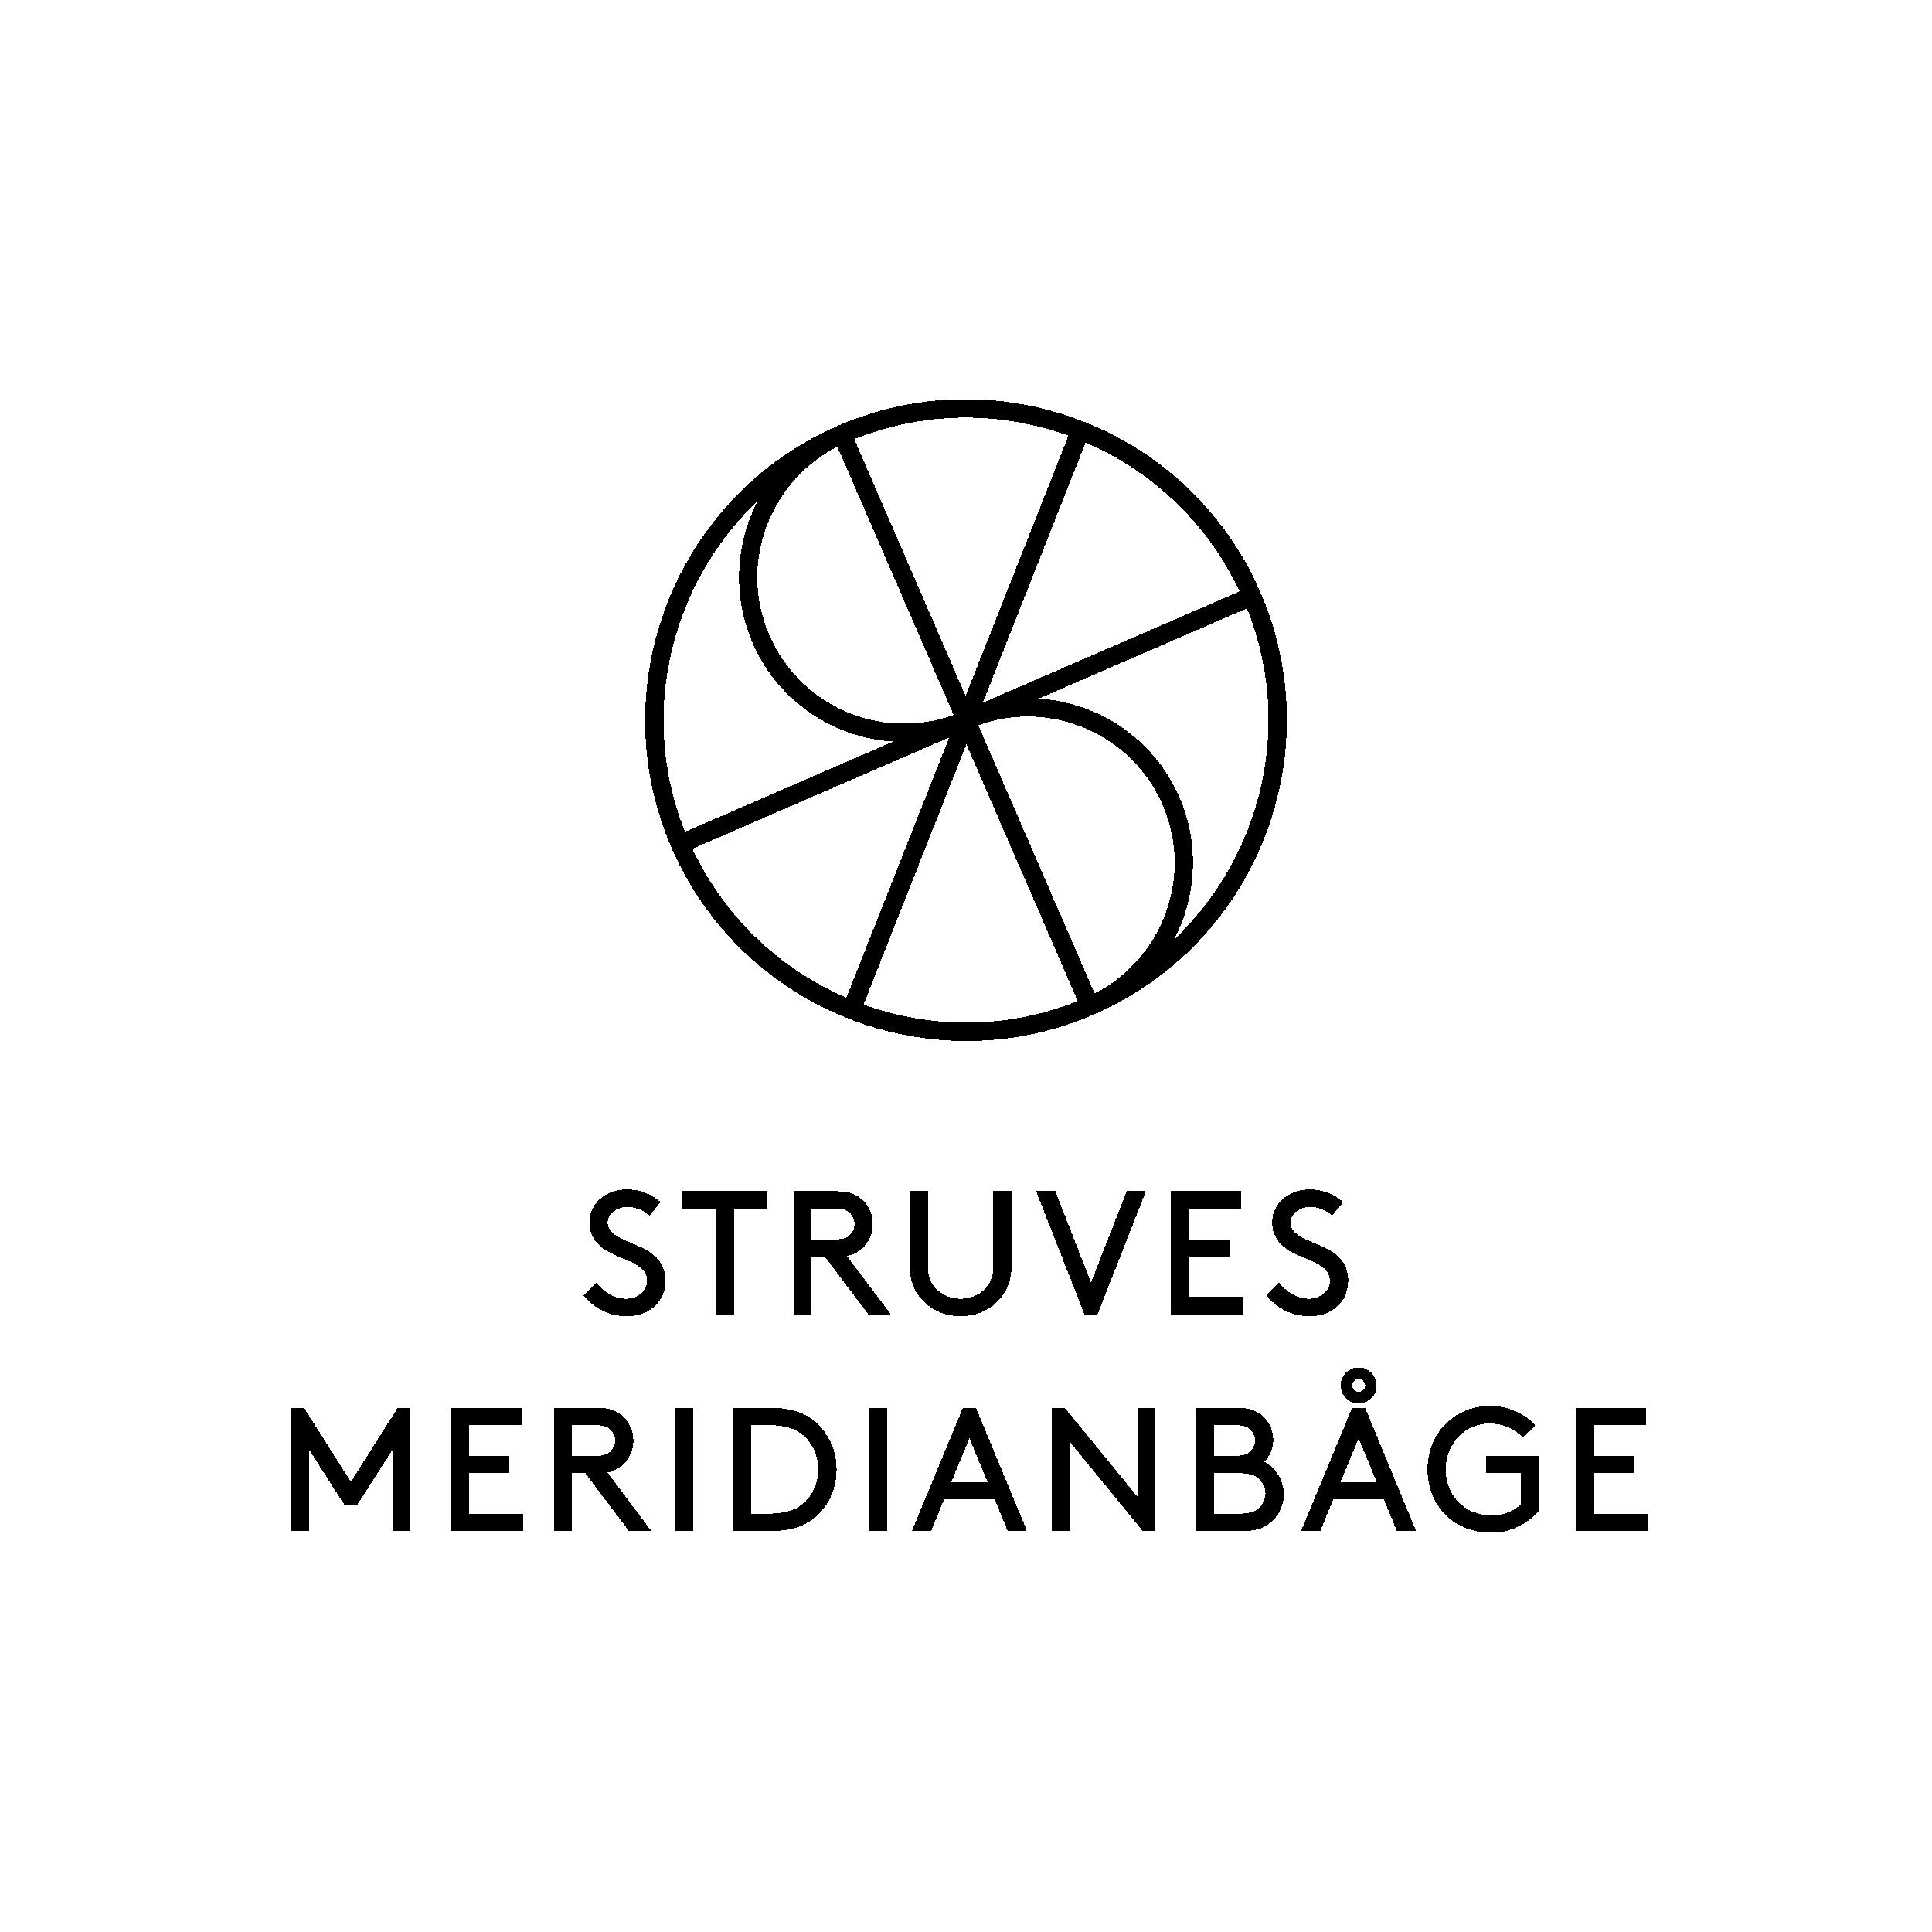 Struve Geodetic Arc Pullinki Övertorneå